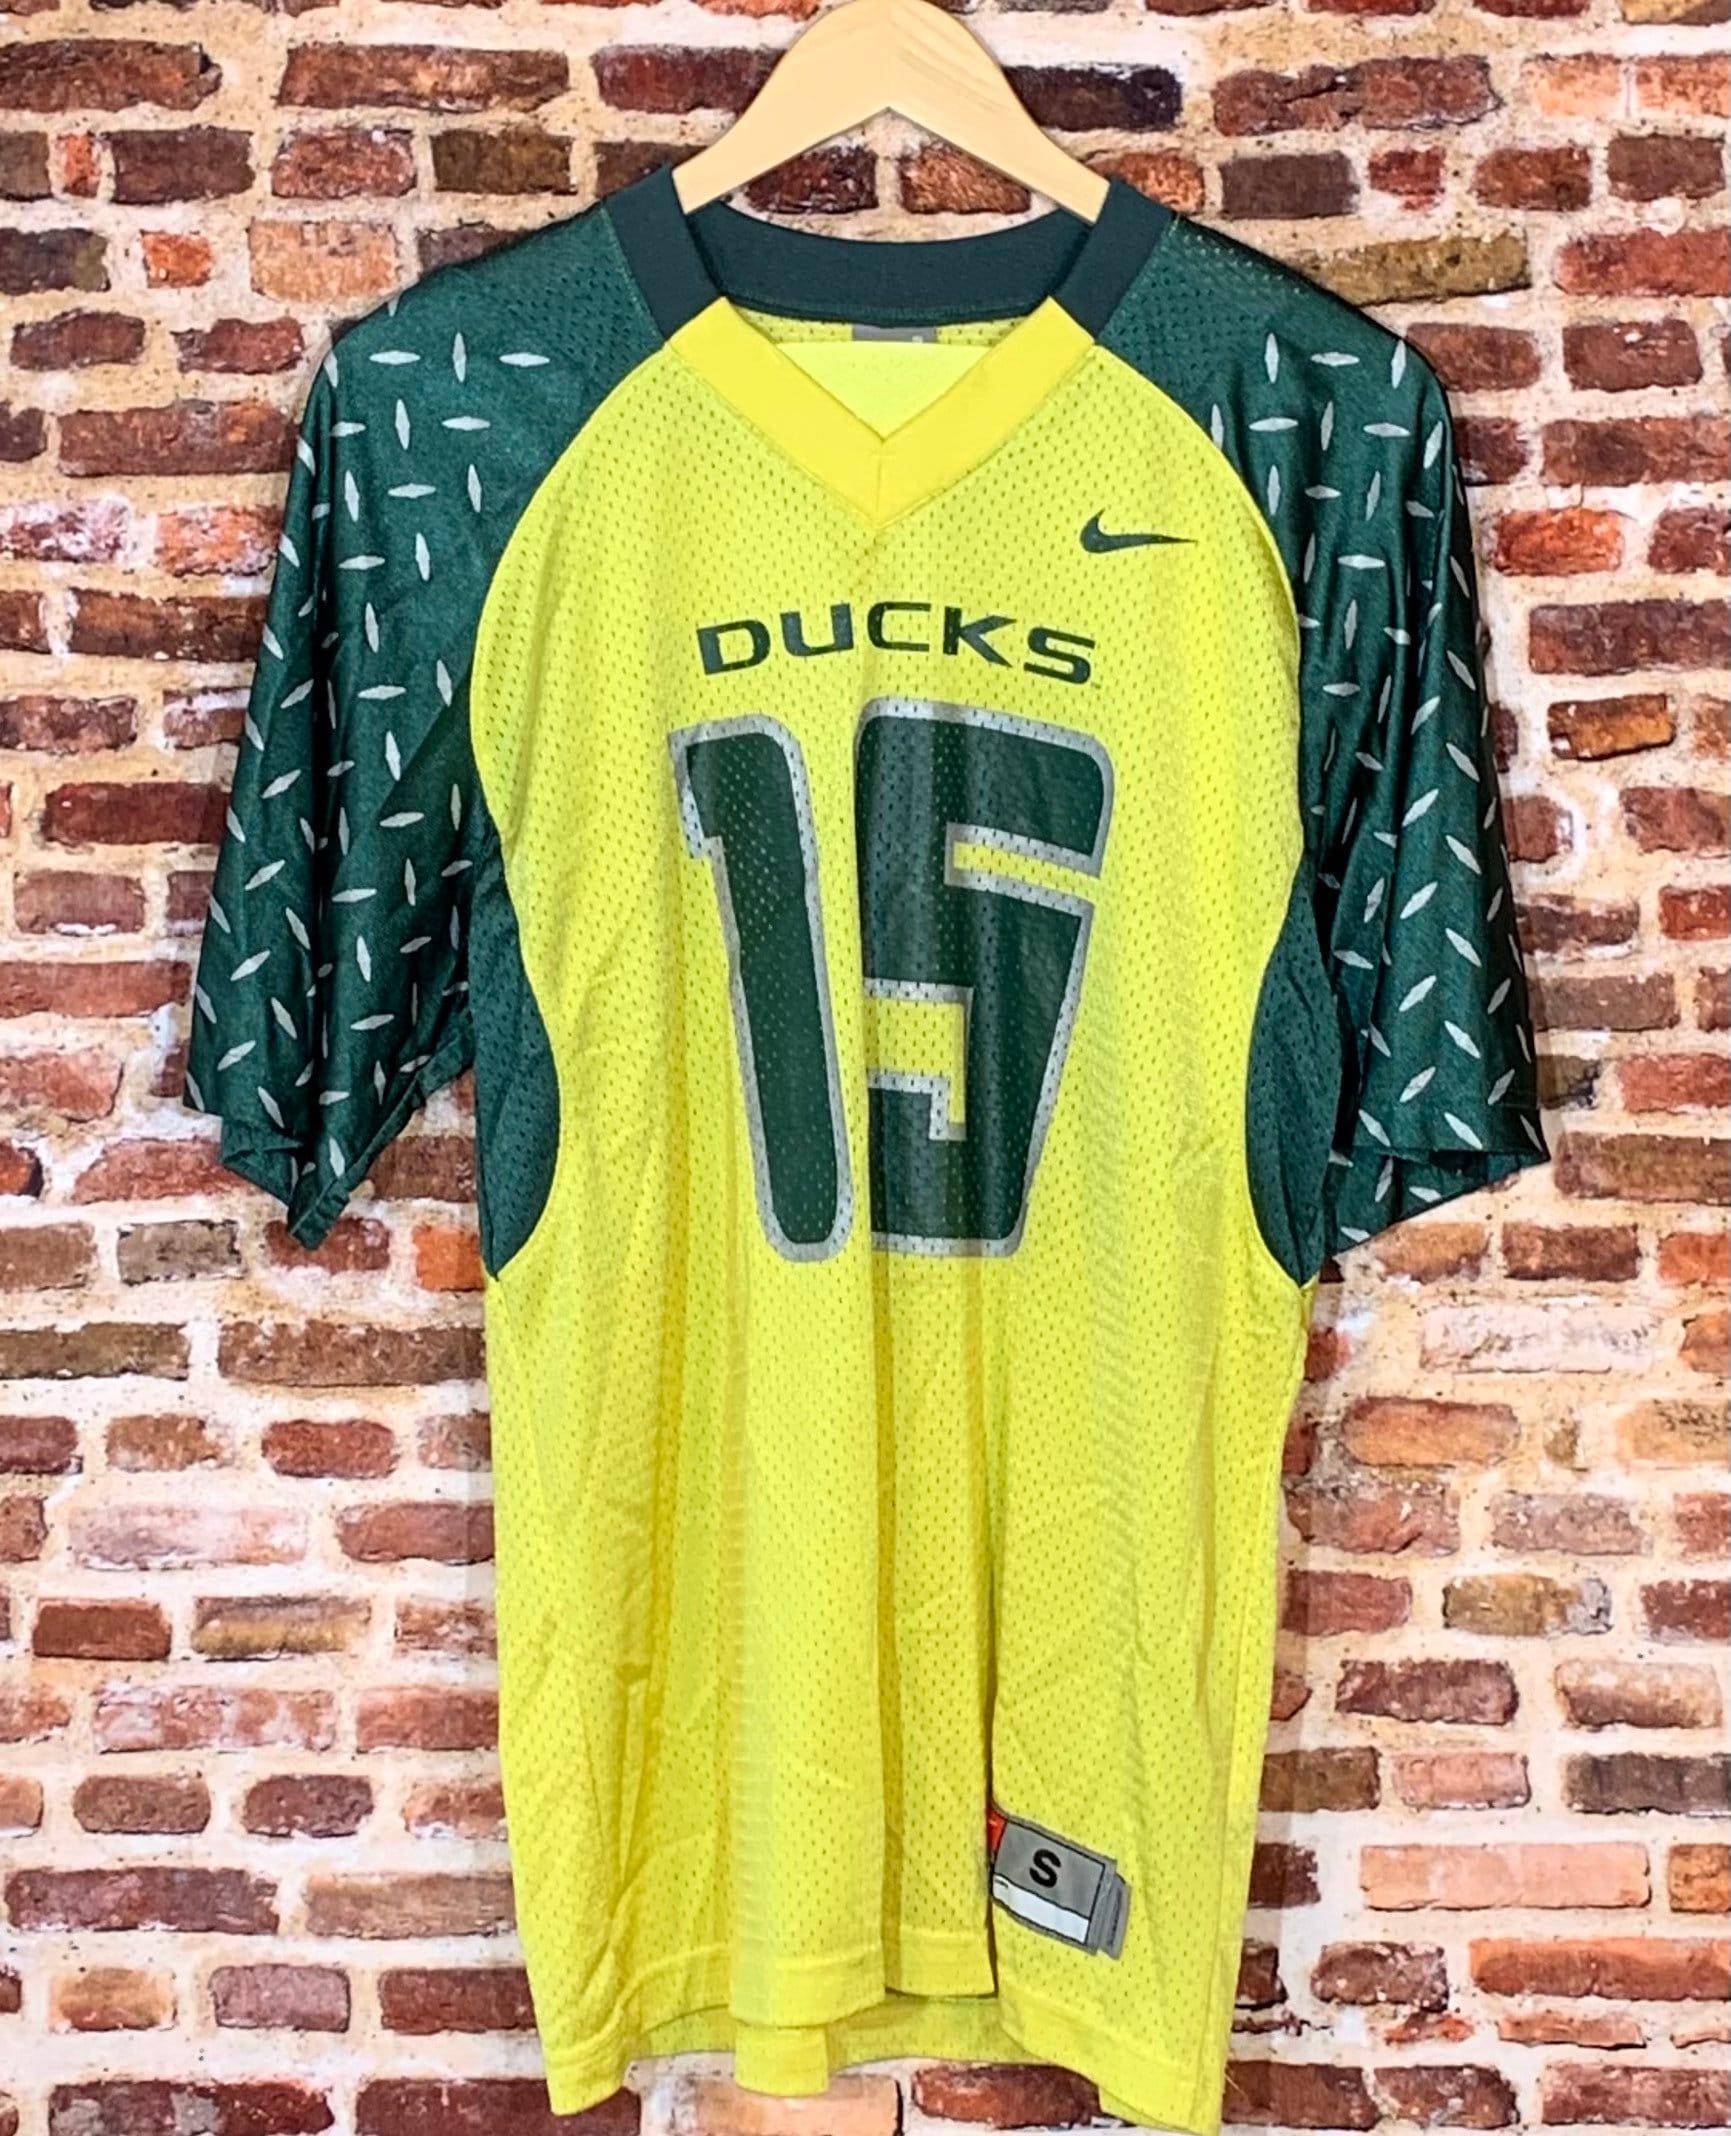 Vintage 2007 Patrick Chung Oregon Ducks Football Men's Small #15 Jersey RARE made by Nike